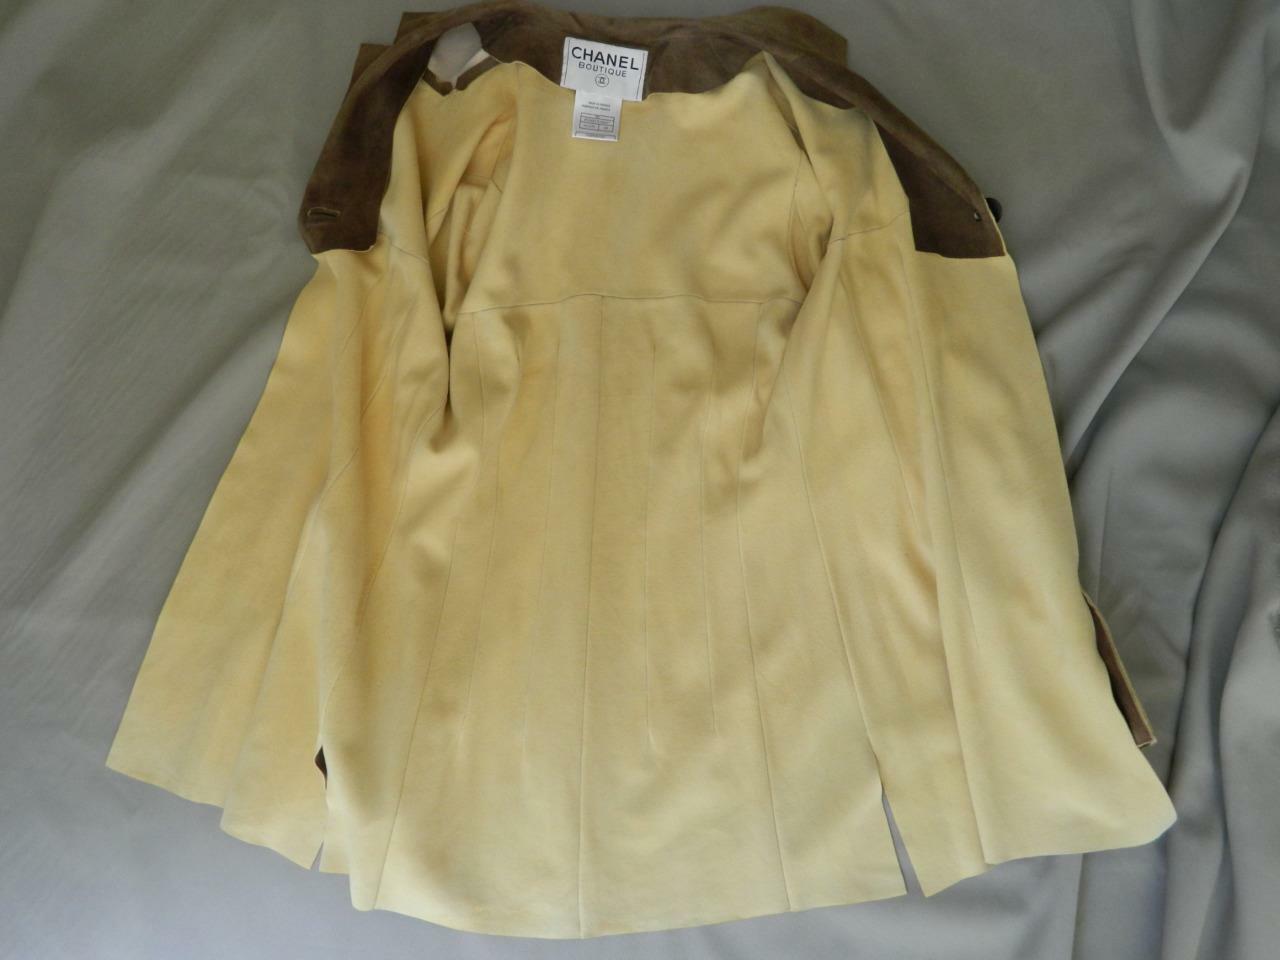 CHANEL Jacket Deer Skin Suede Chanel Horn Button … - image 11